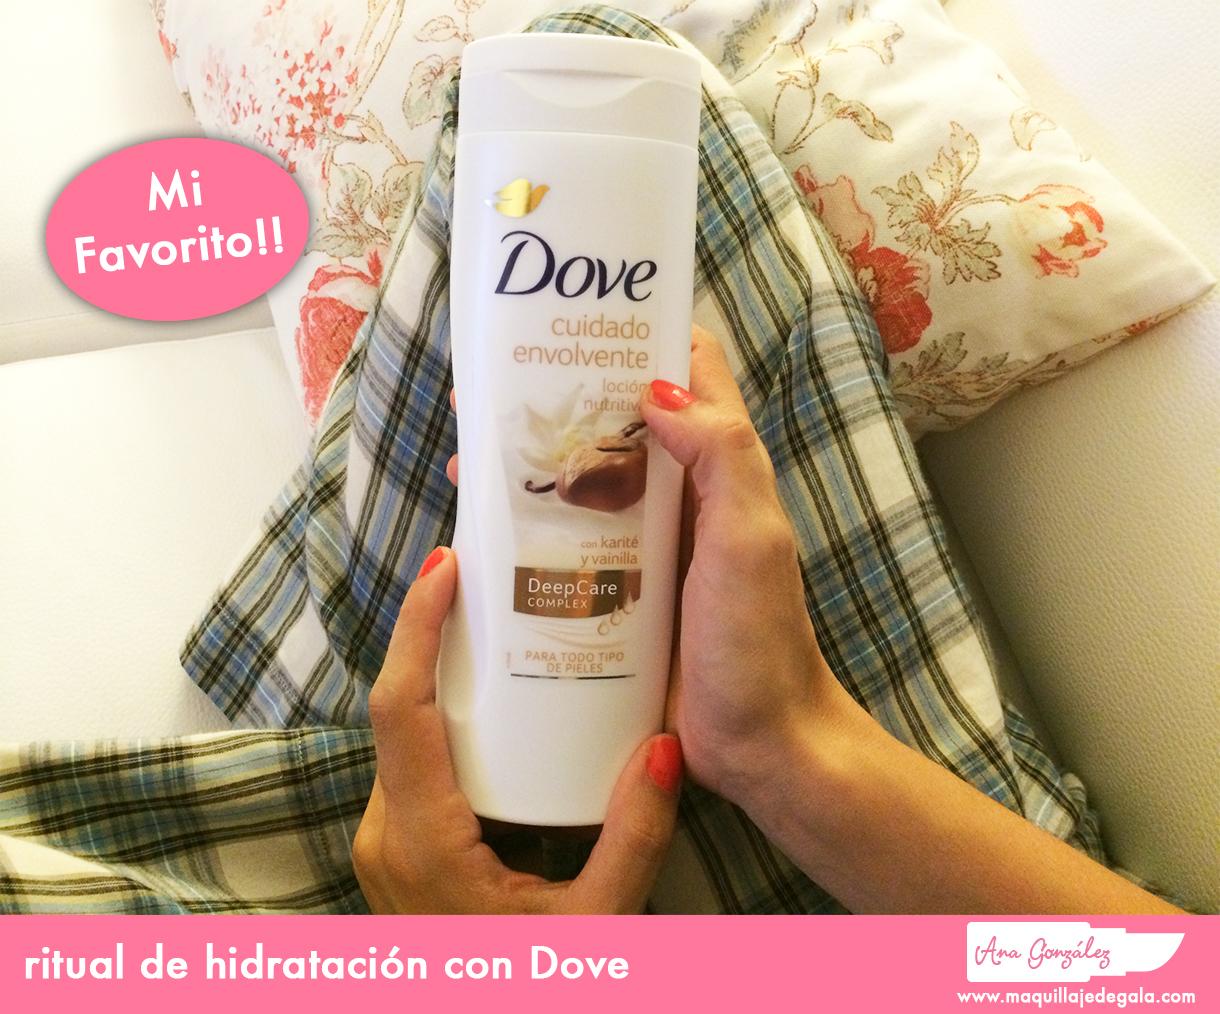 ritual_hidratacion_dove (1)